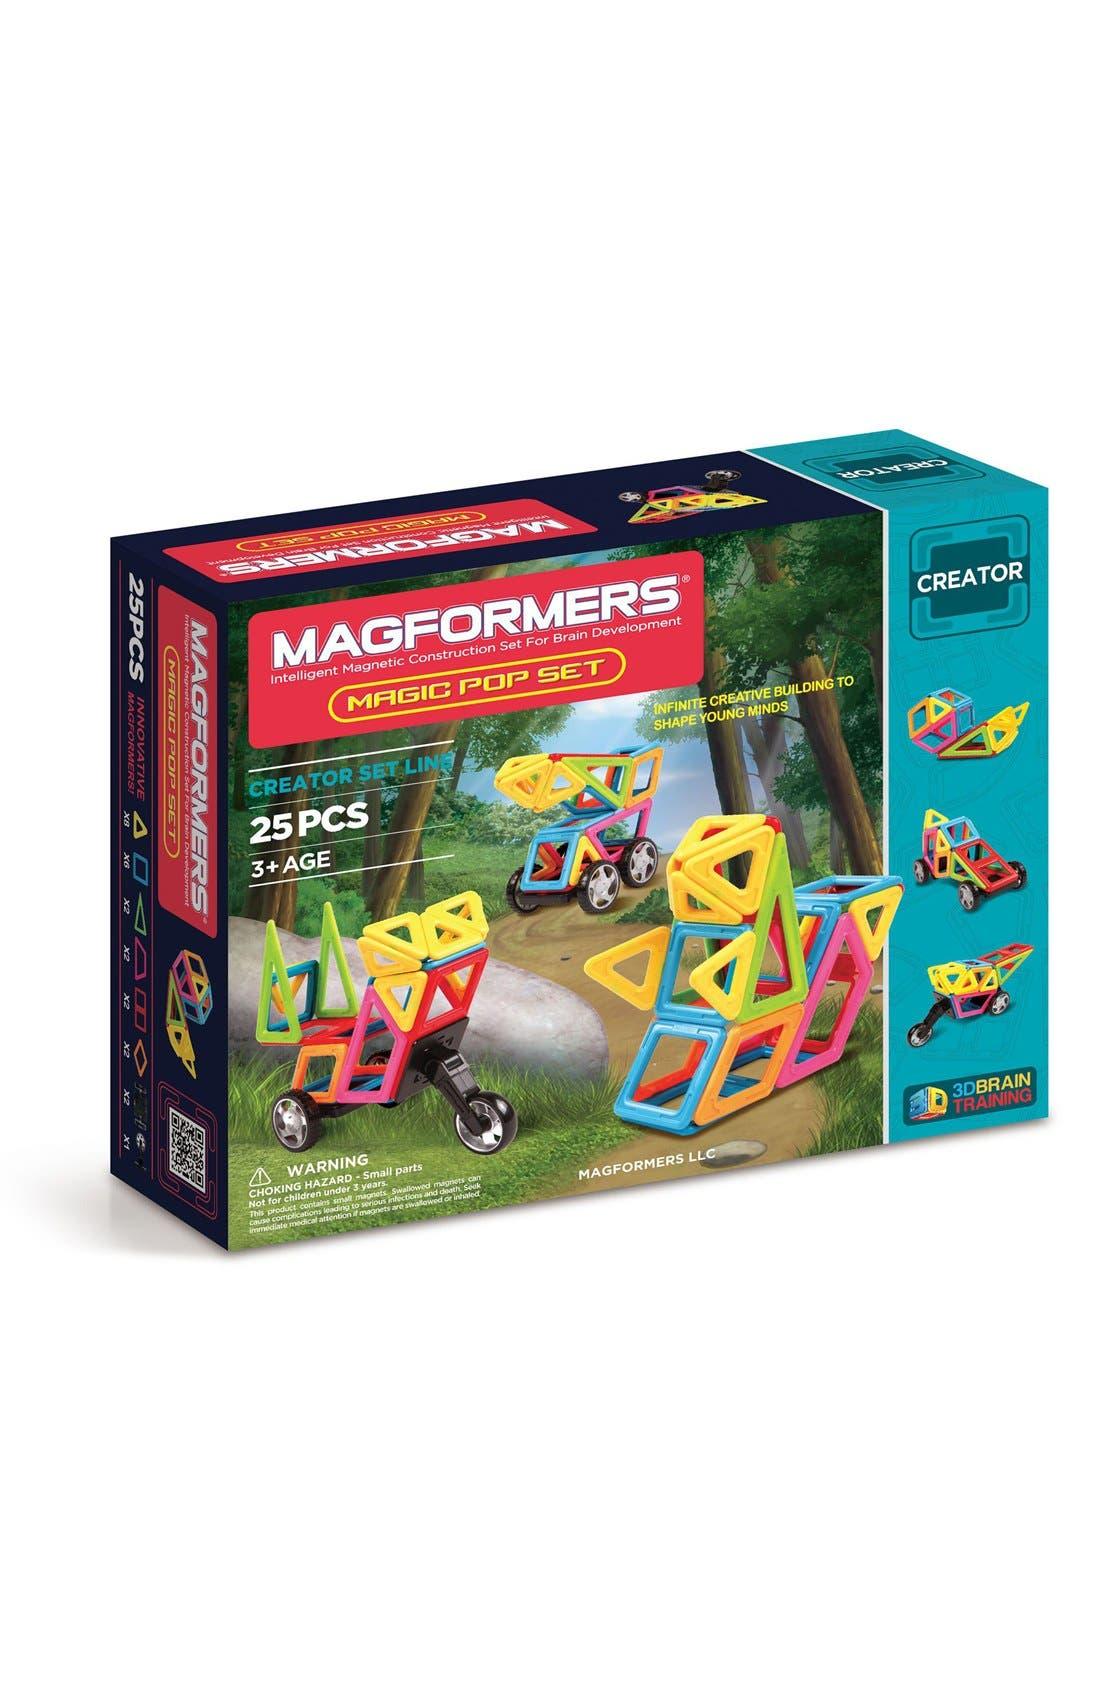 Magformers 'Creator - Magic Pop' Magnetic 3D Construction Set